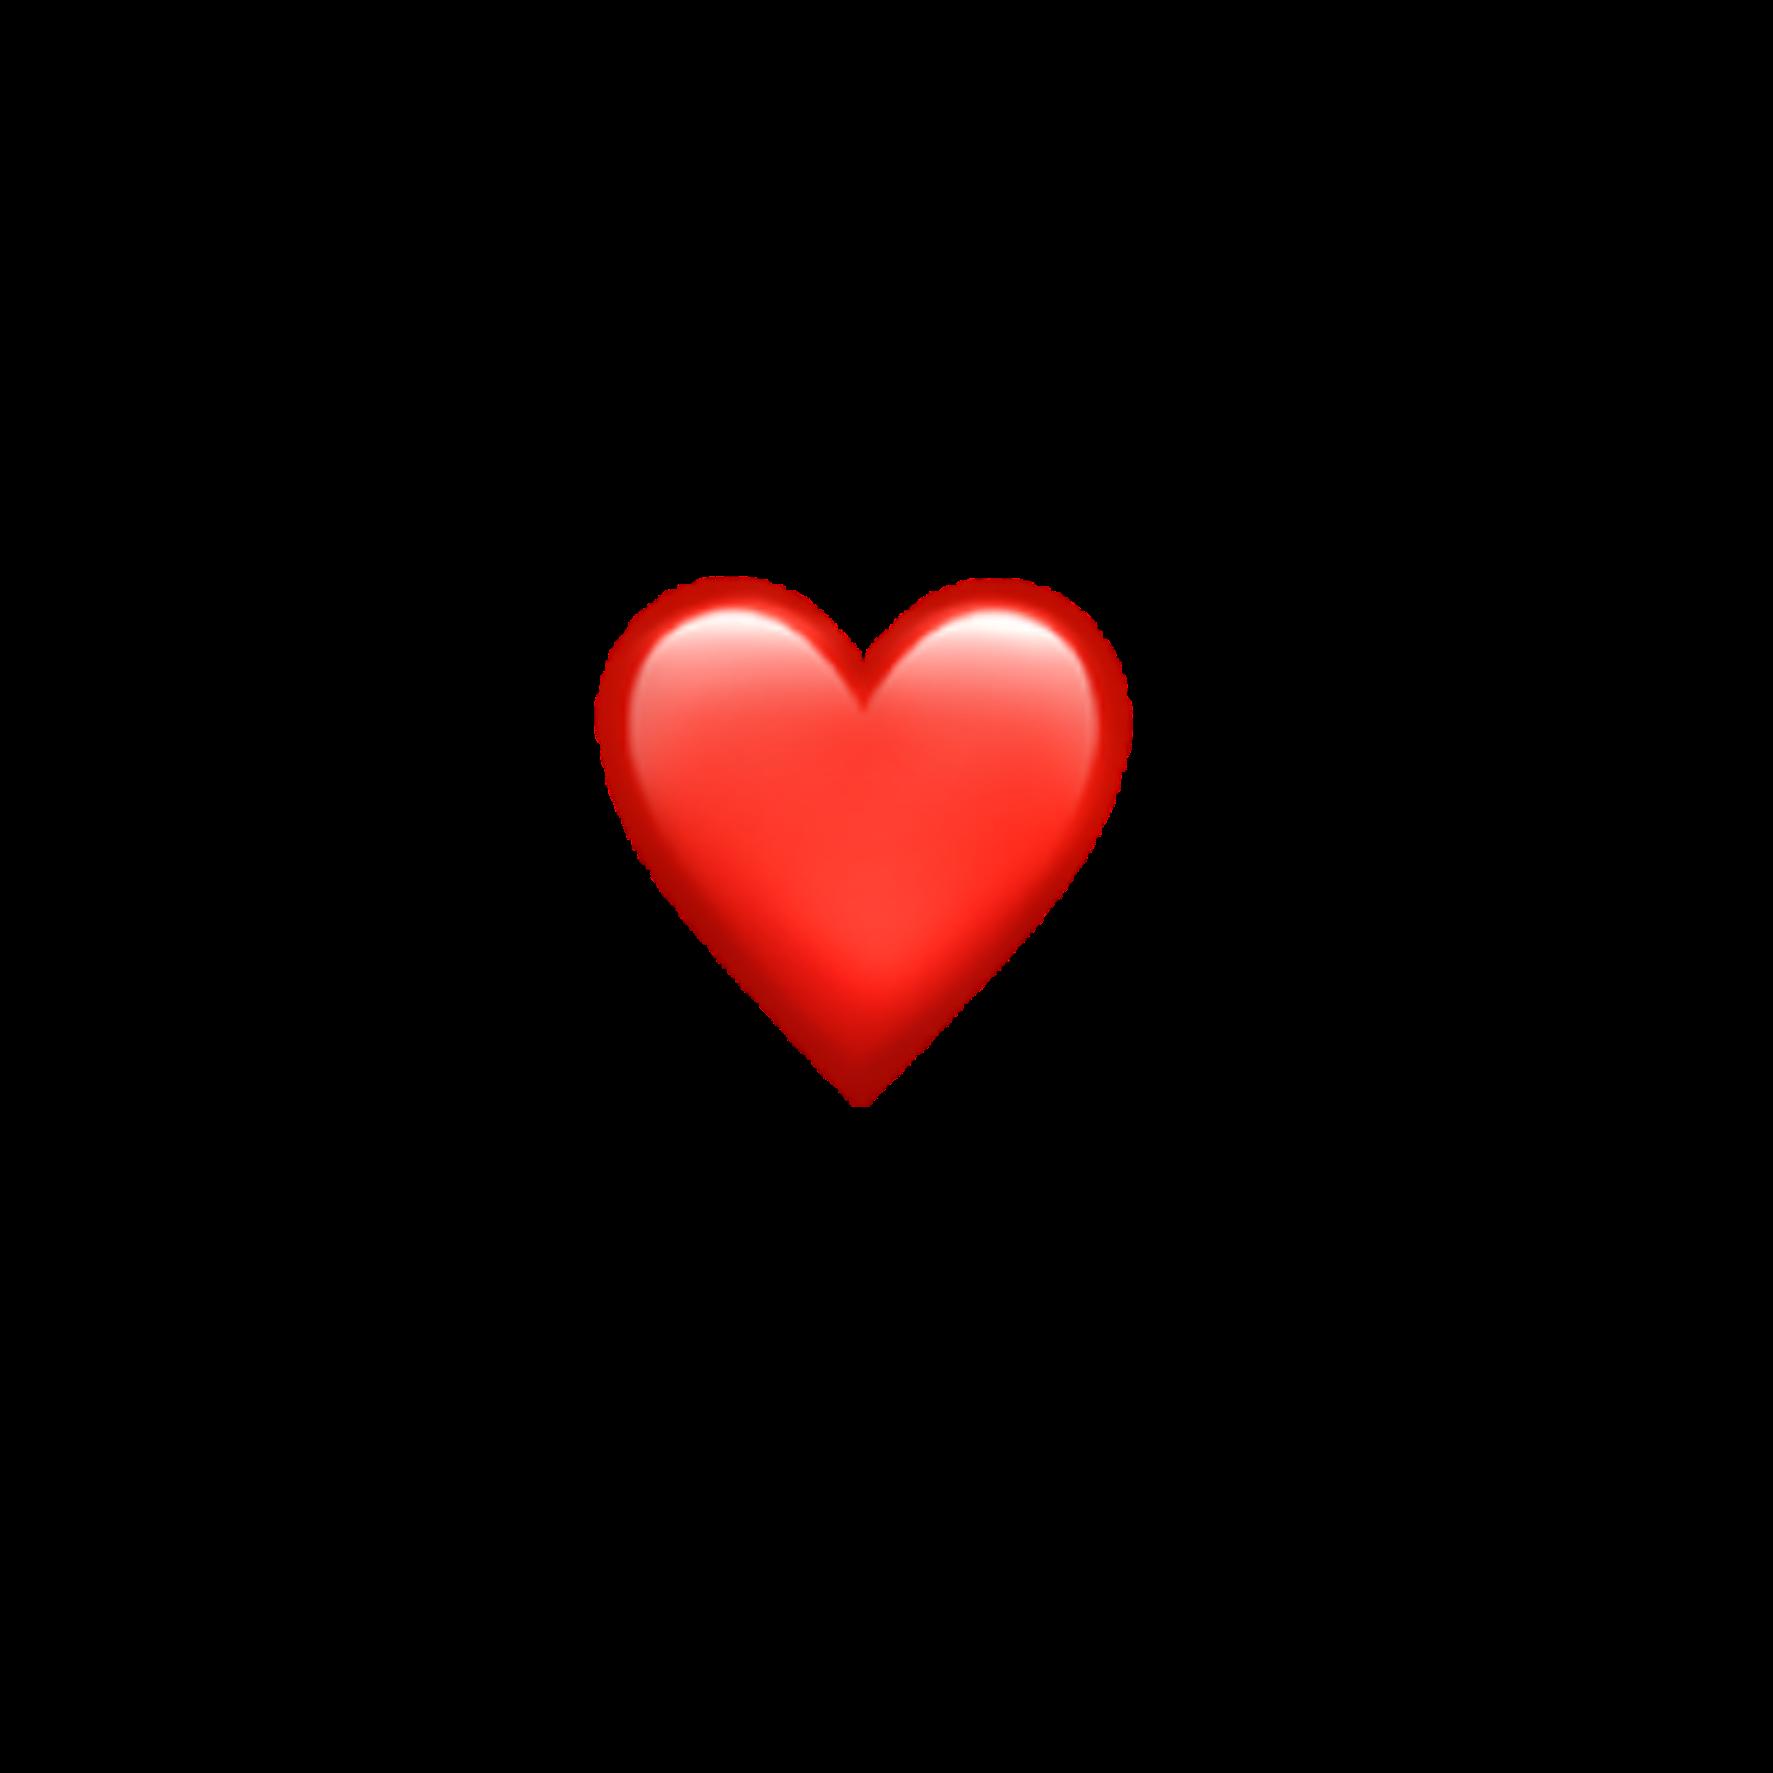 Heart Red Heart Emoji